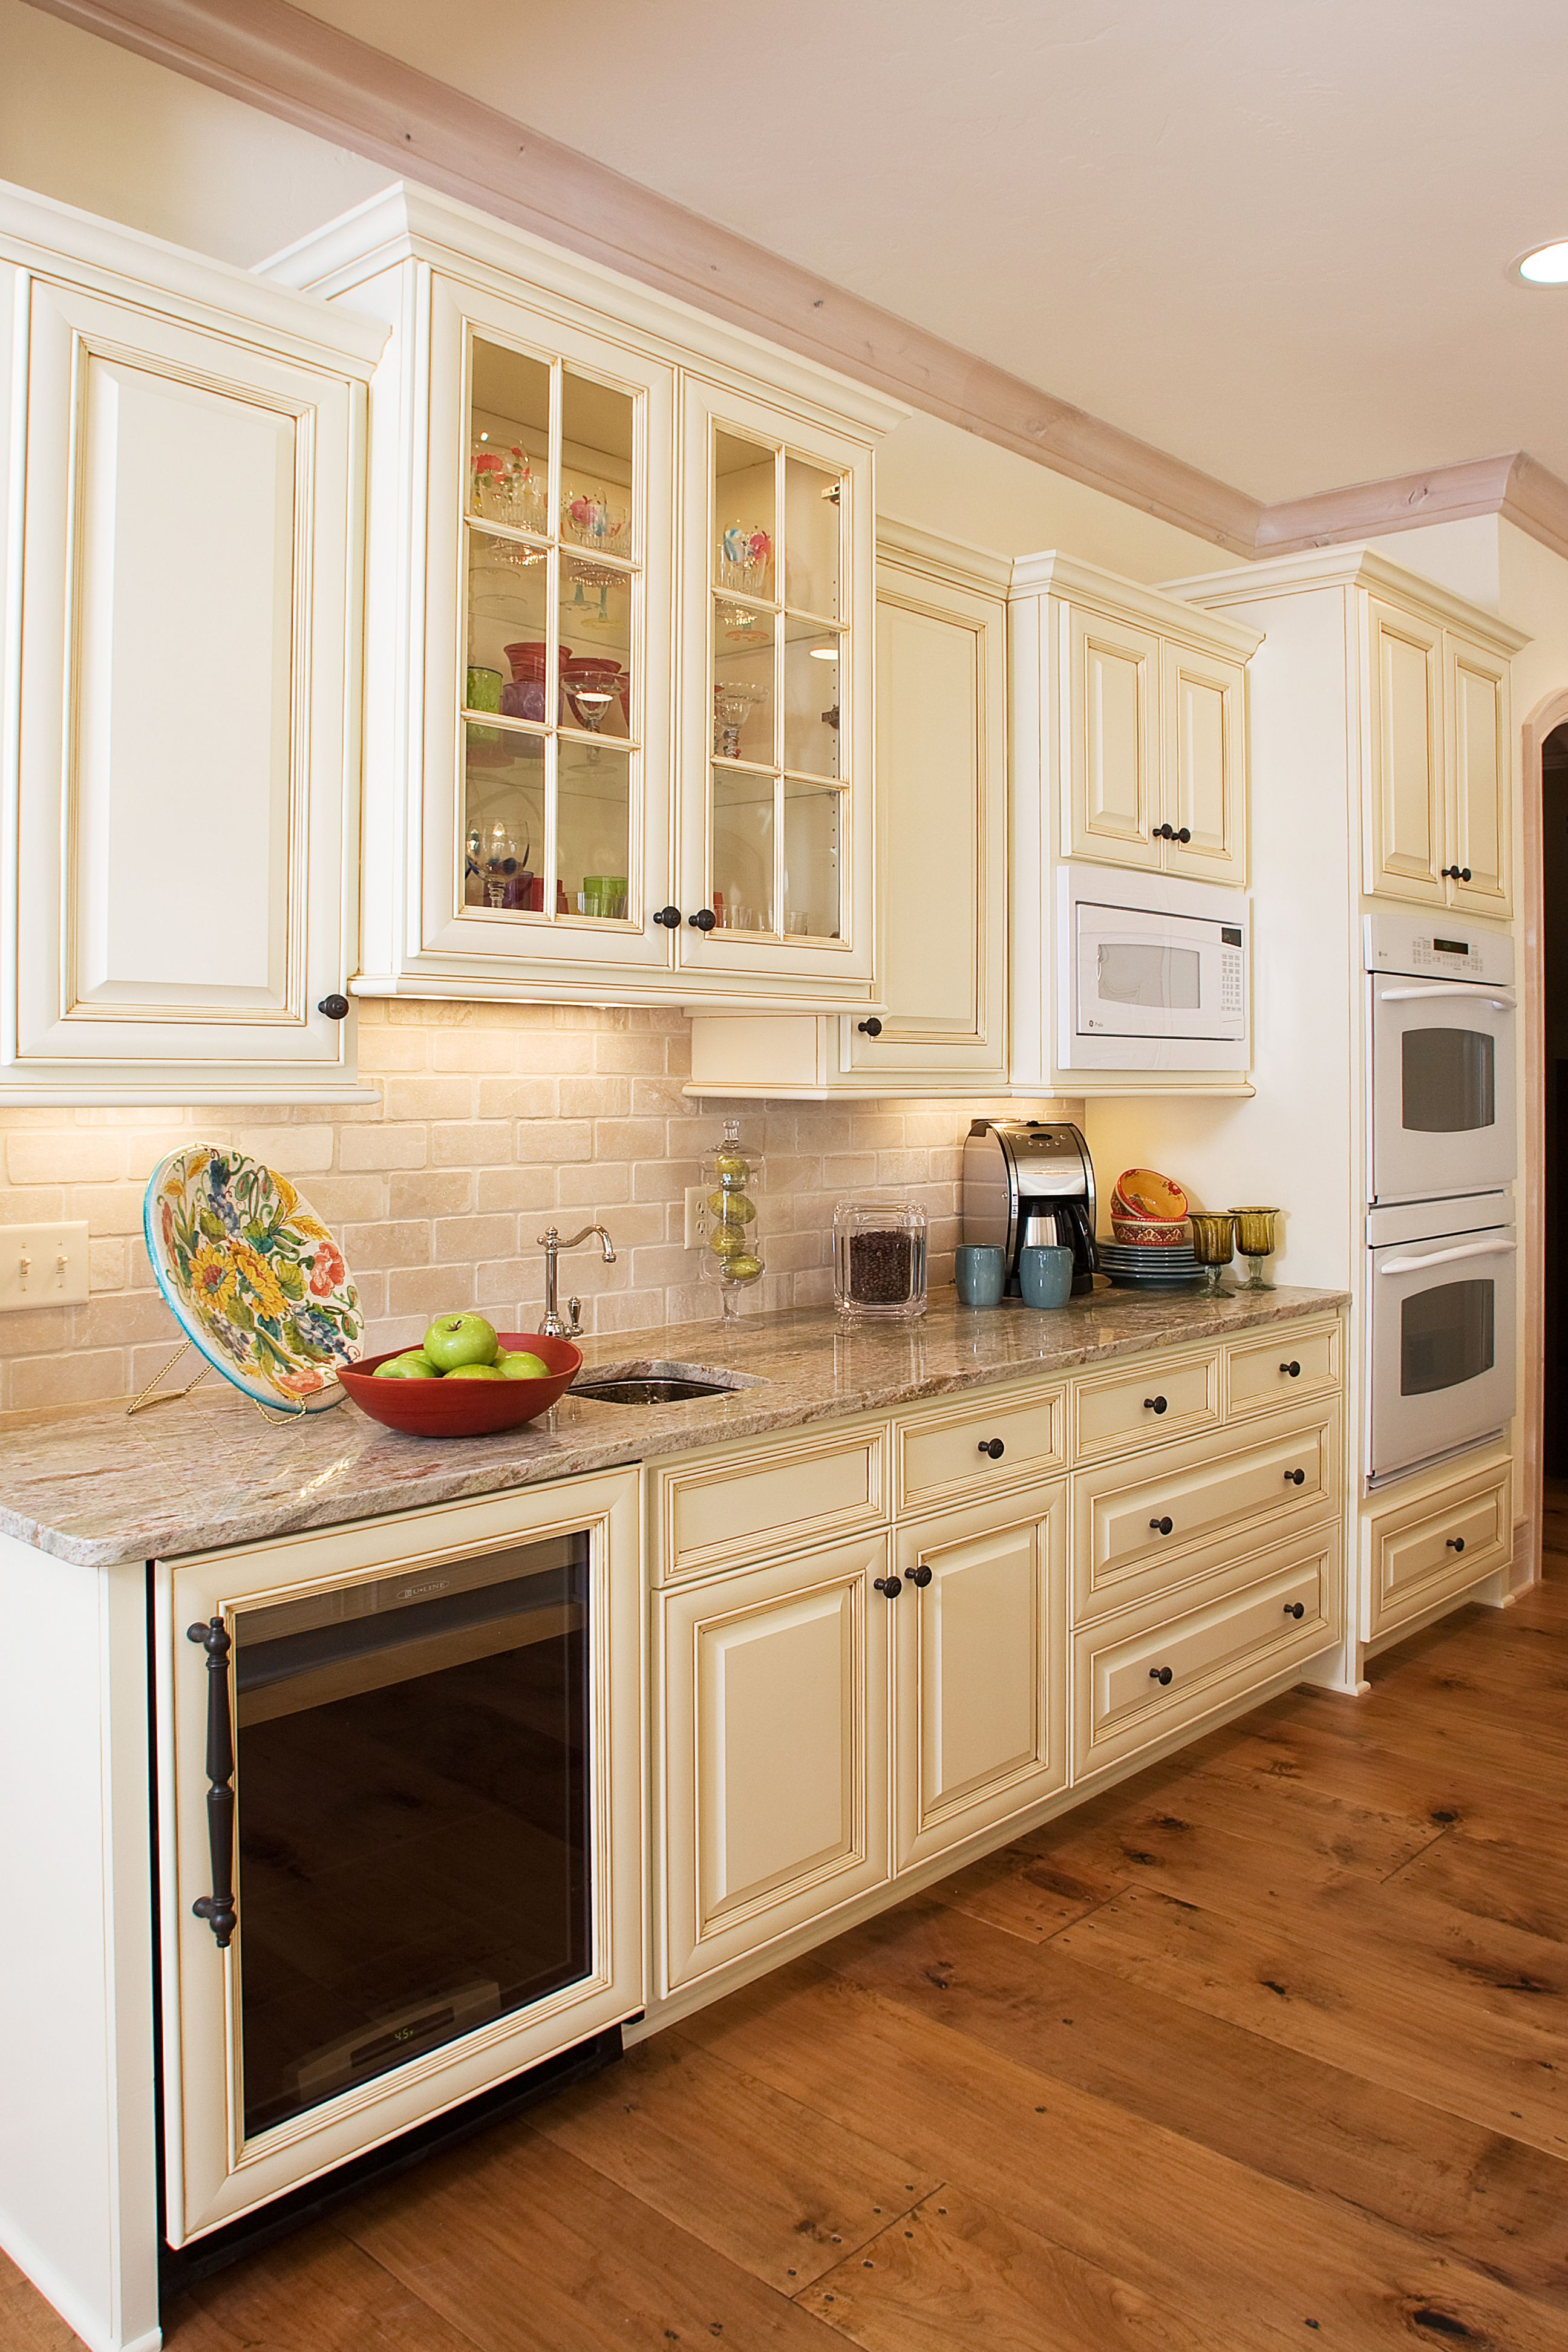 barenzbuilders Painted Kitchen cabinets